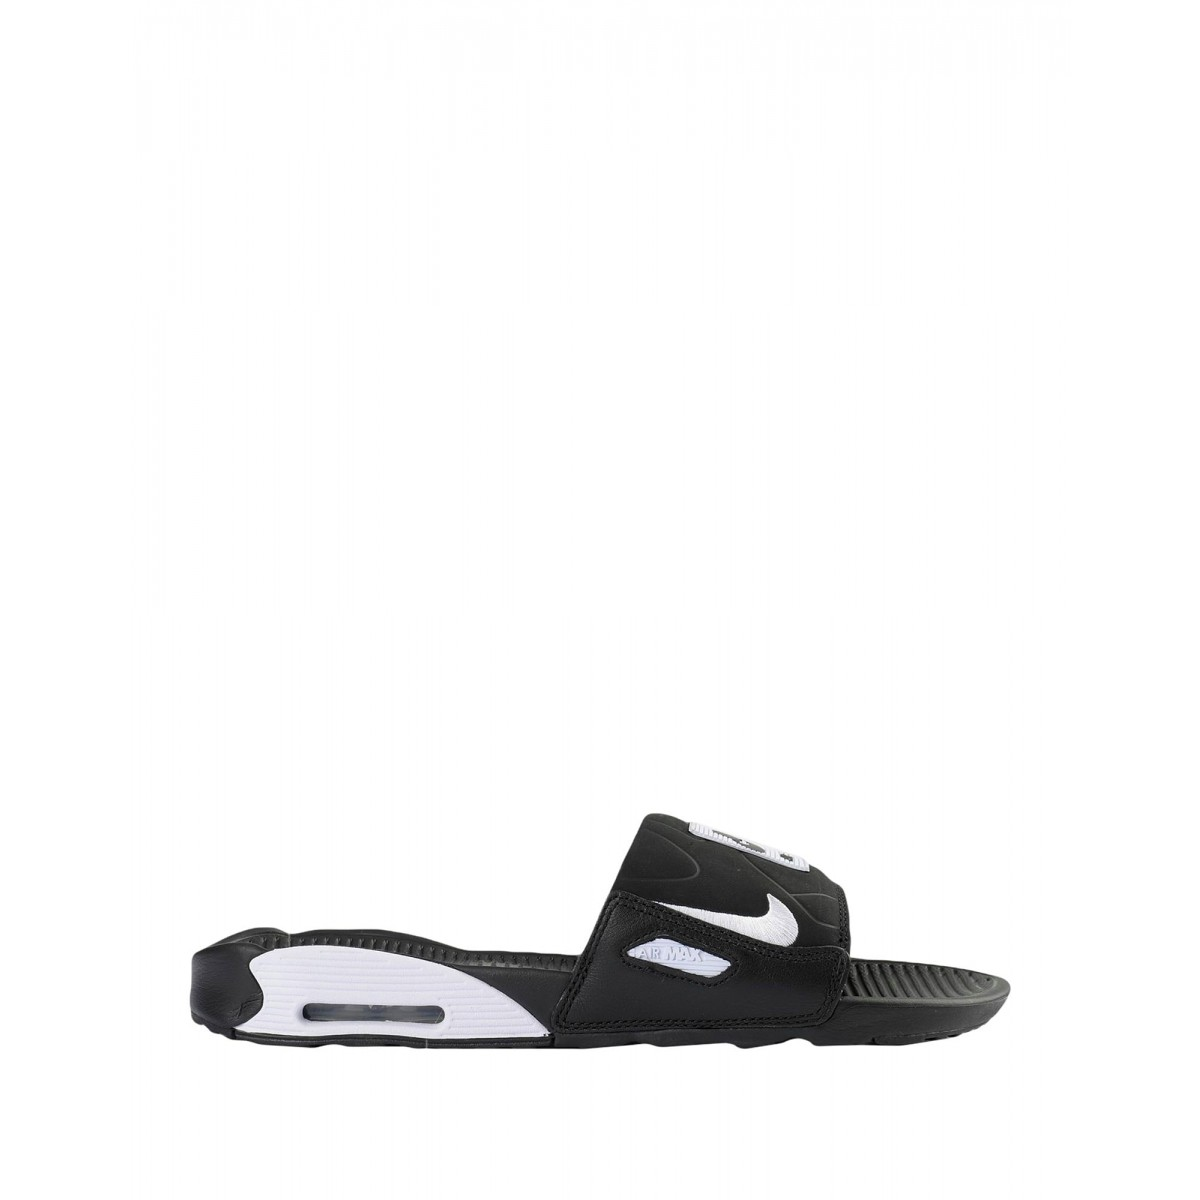 sandale nike, OFF 79%,Cheap price !